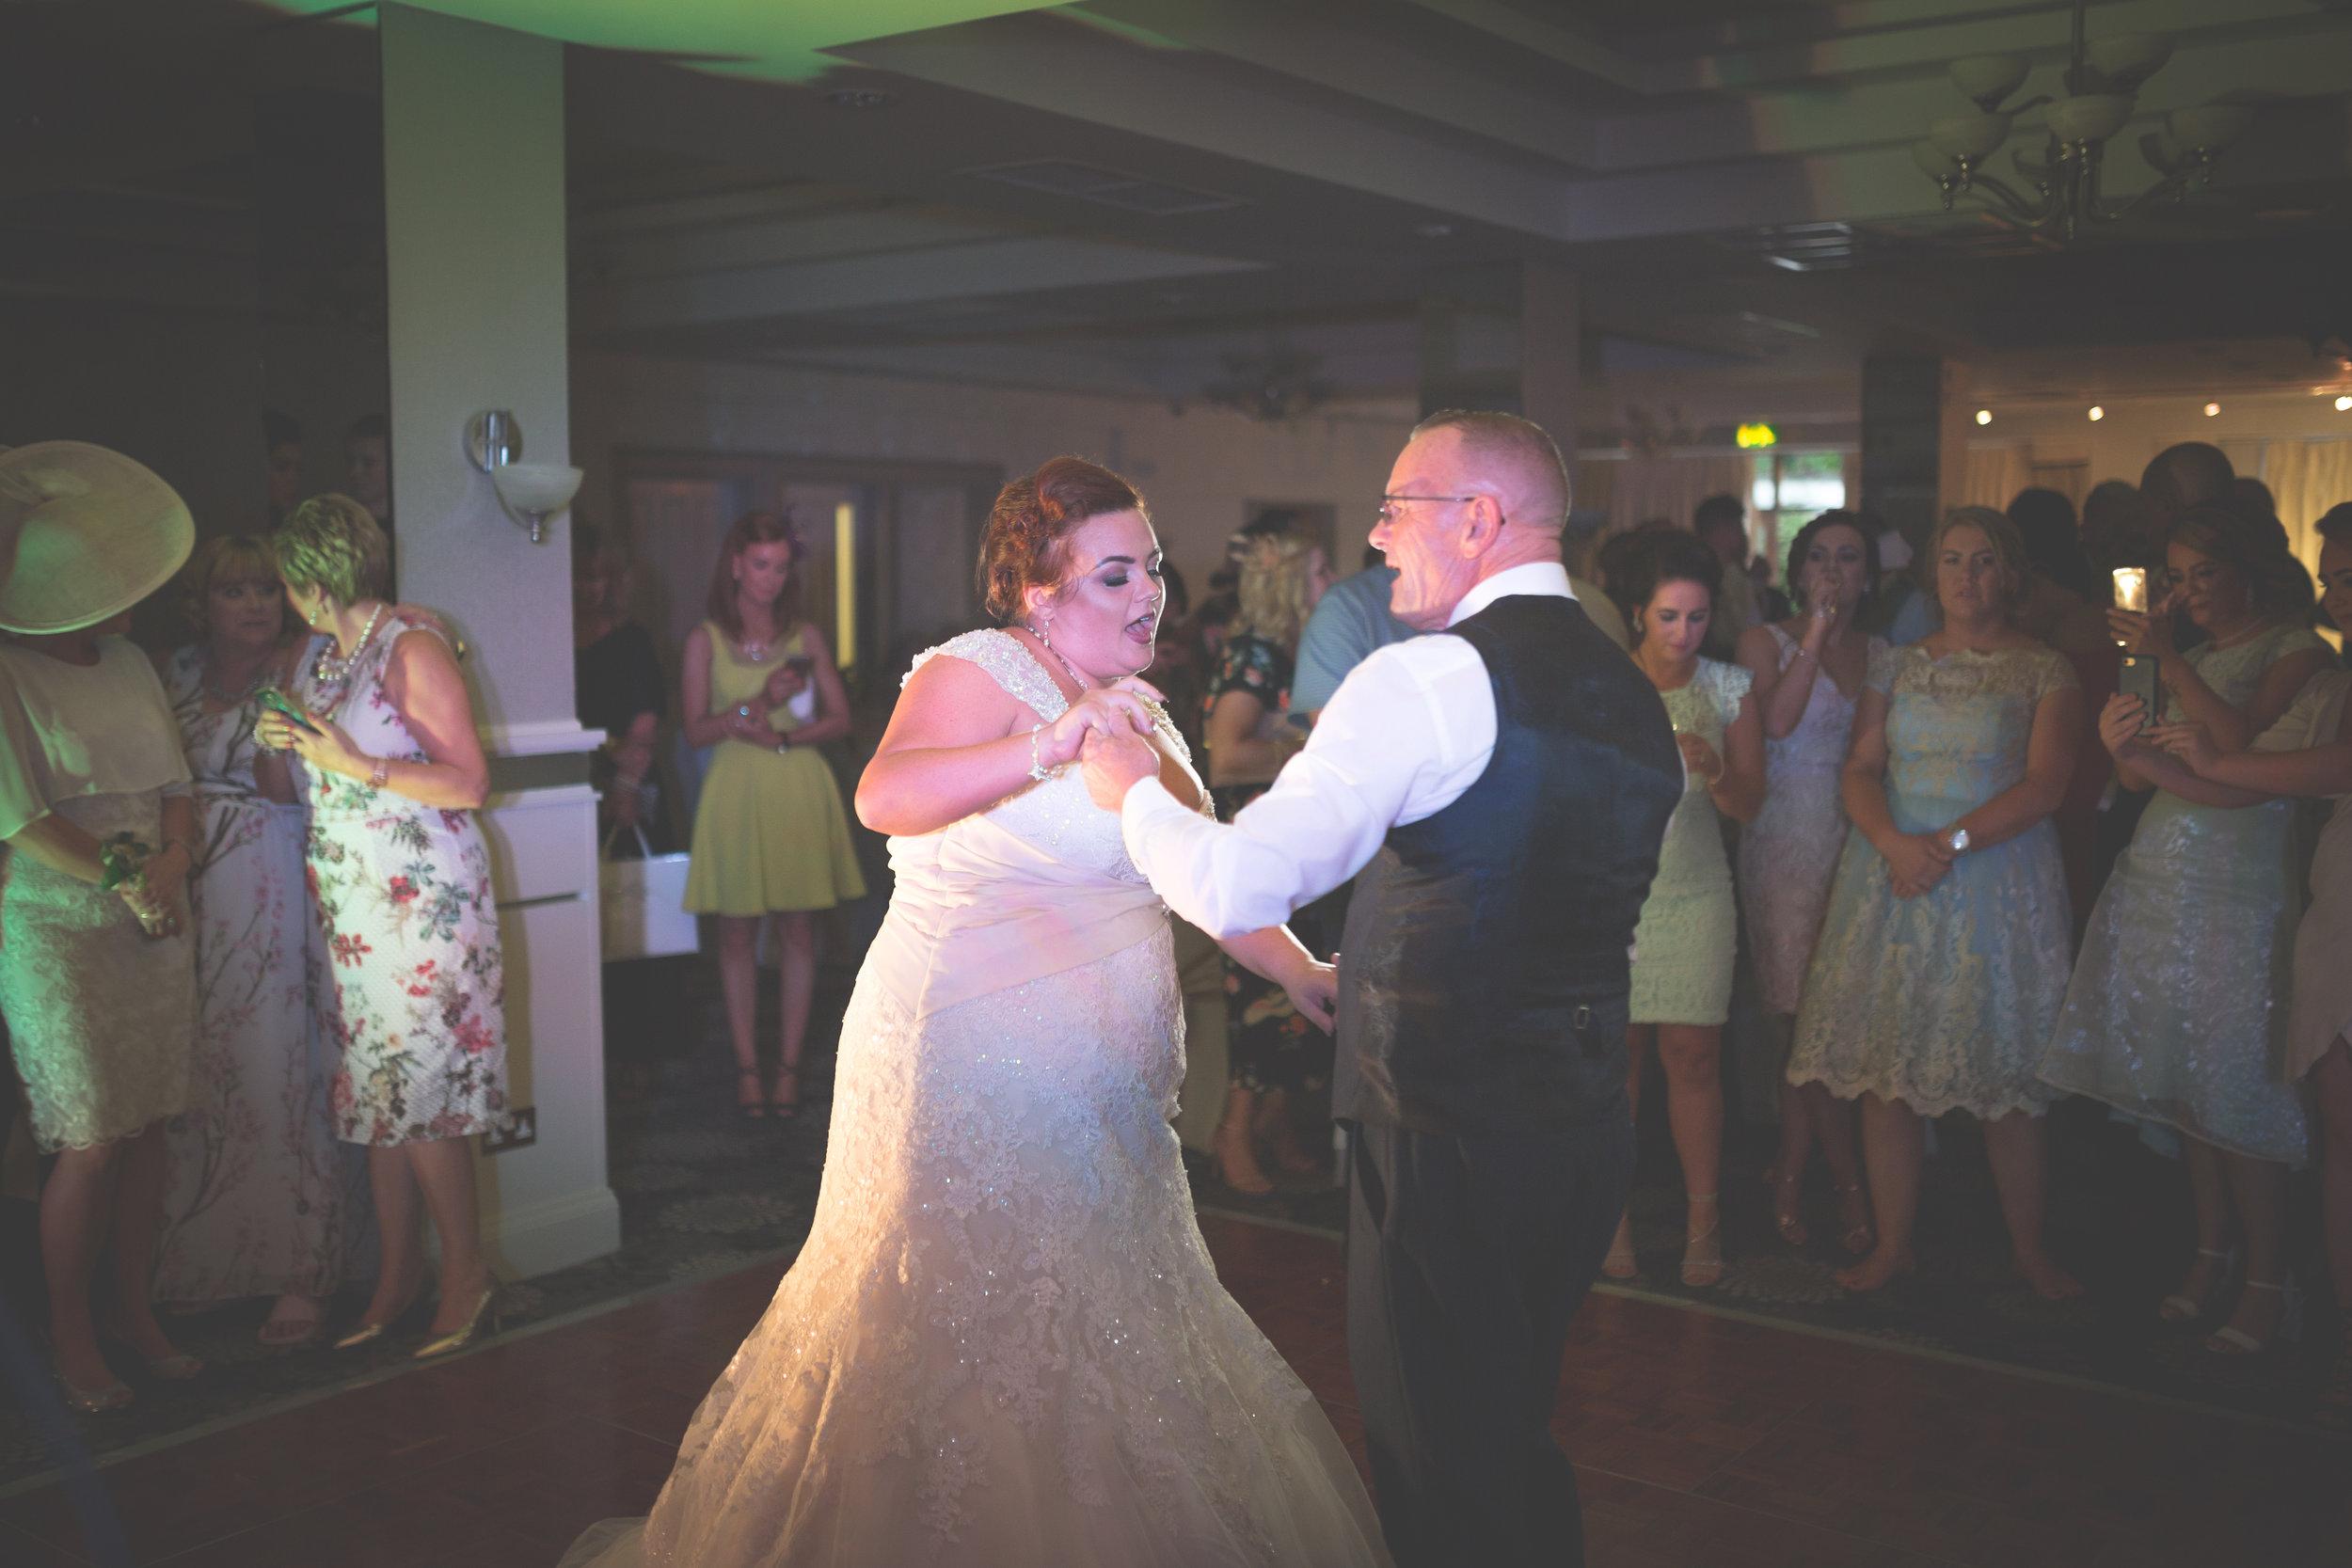 Antoinette & Stephen - First Dance | Brian McEwan Photography | Wedding Photographer Northern Ireland 47.jpg